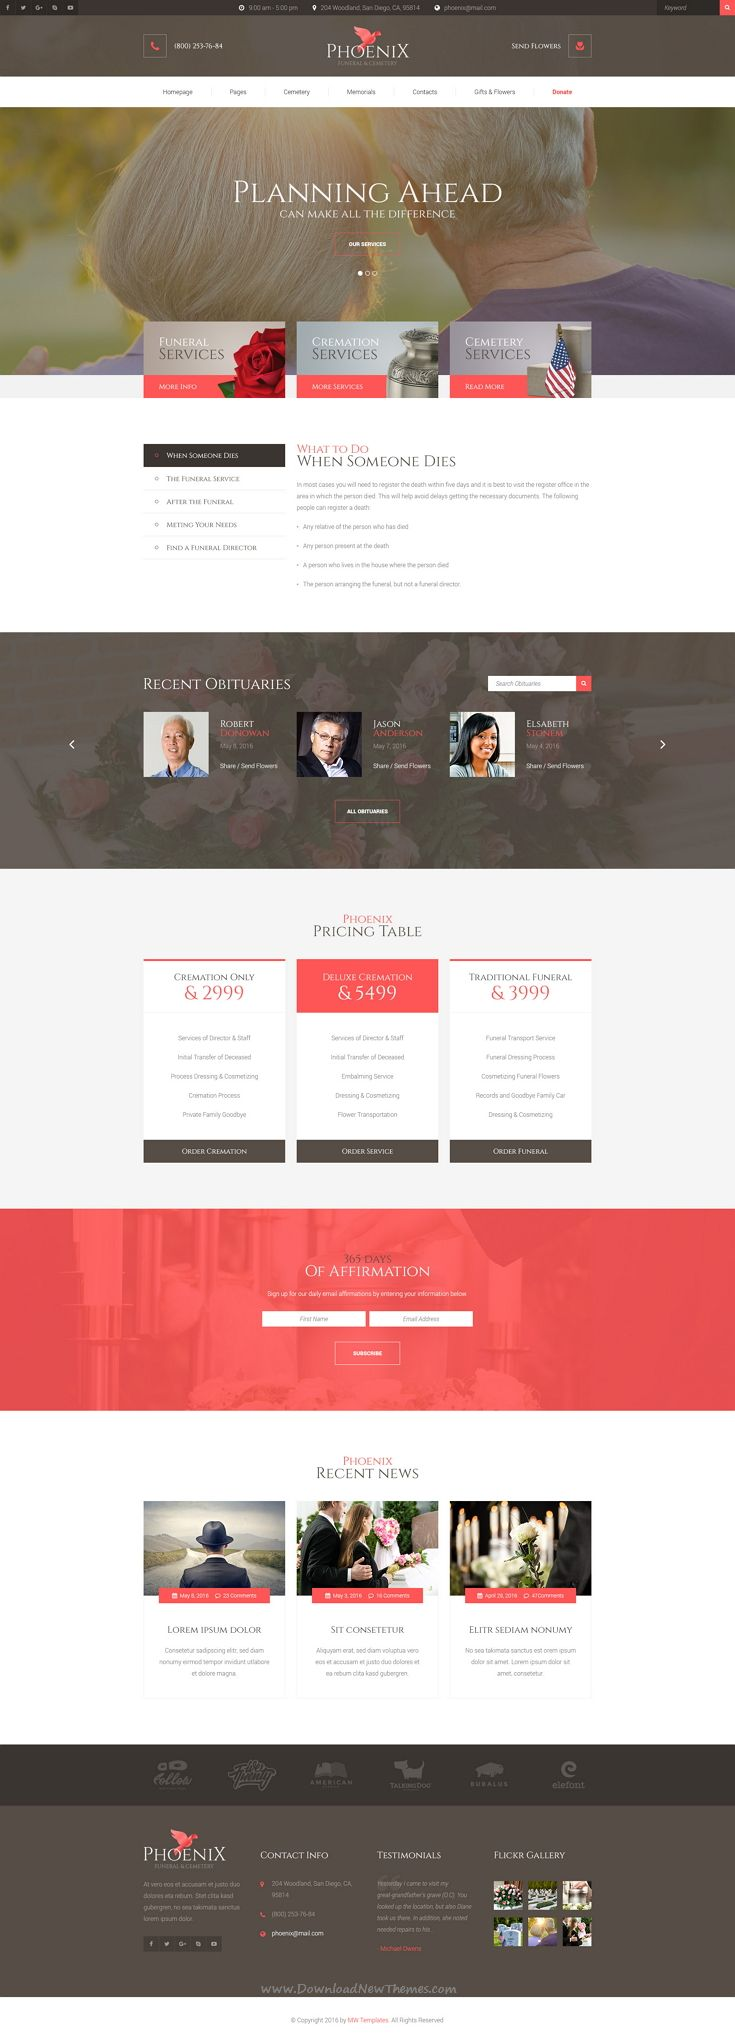 Phoenix   Funeral Service, Funeral Home U0026 Cemetery PSD Template. Website  Design ...